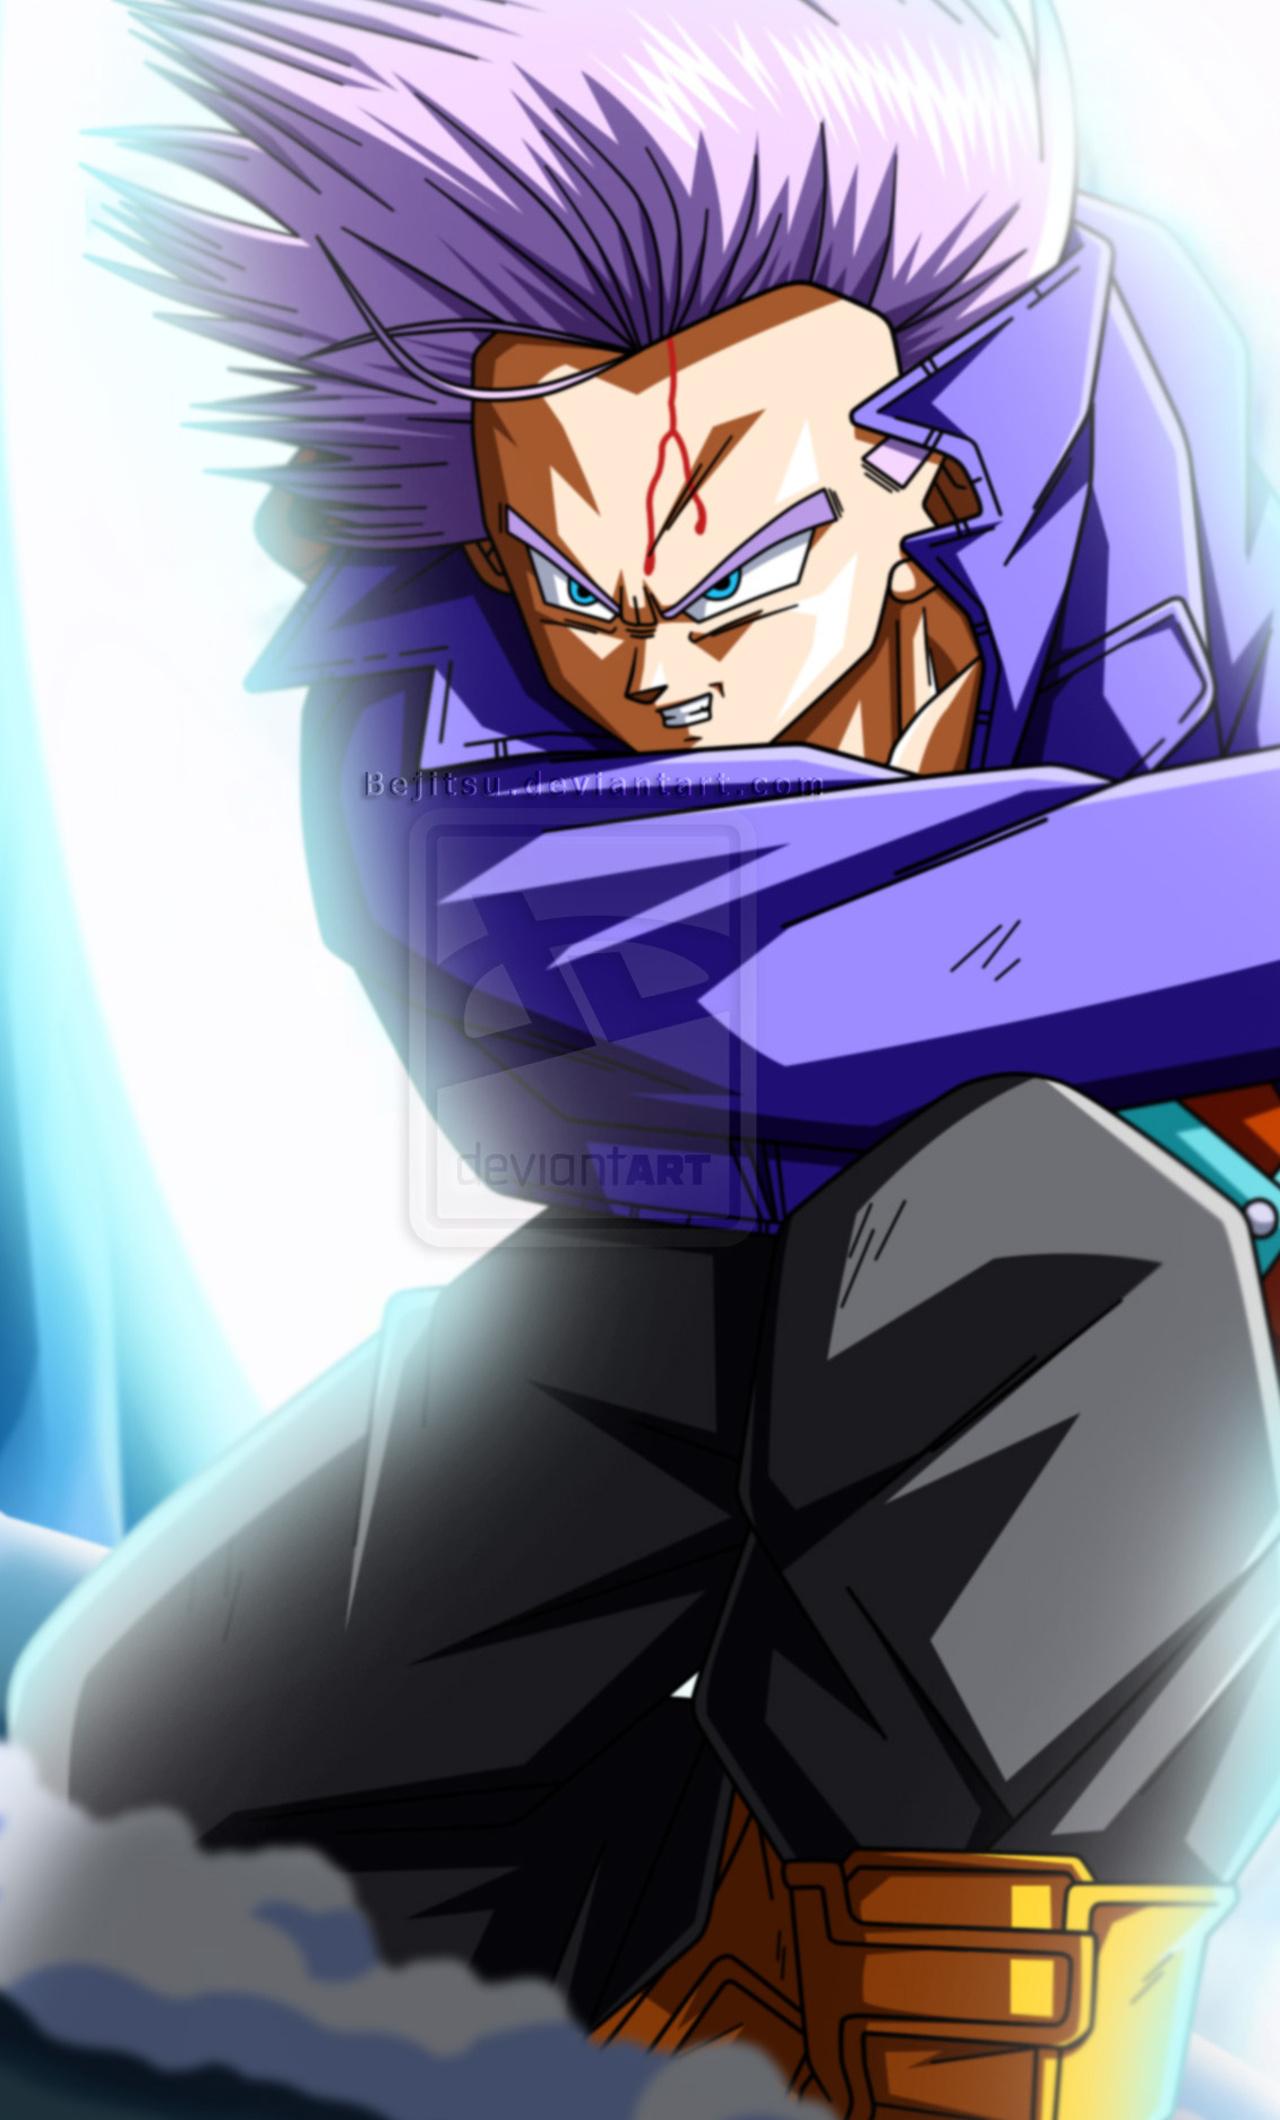 Trunks Dragon Ball Z 4k He